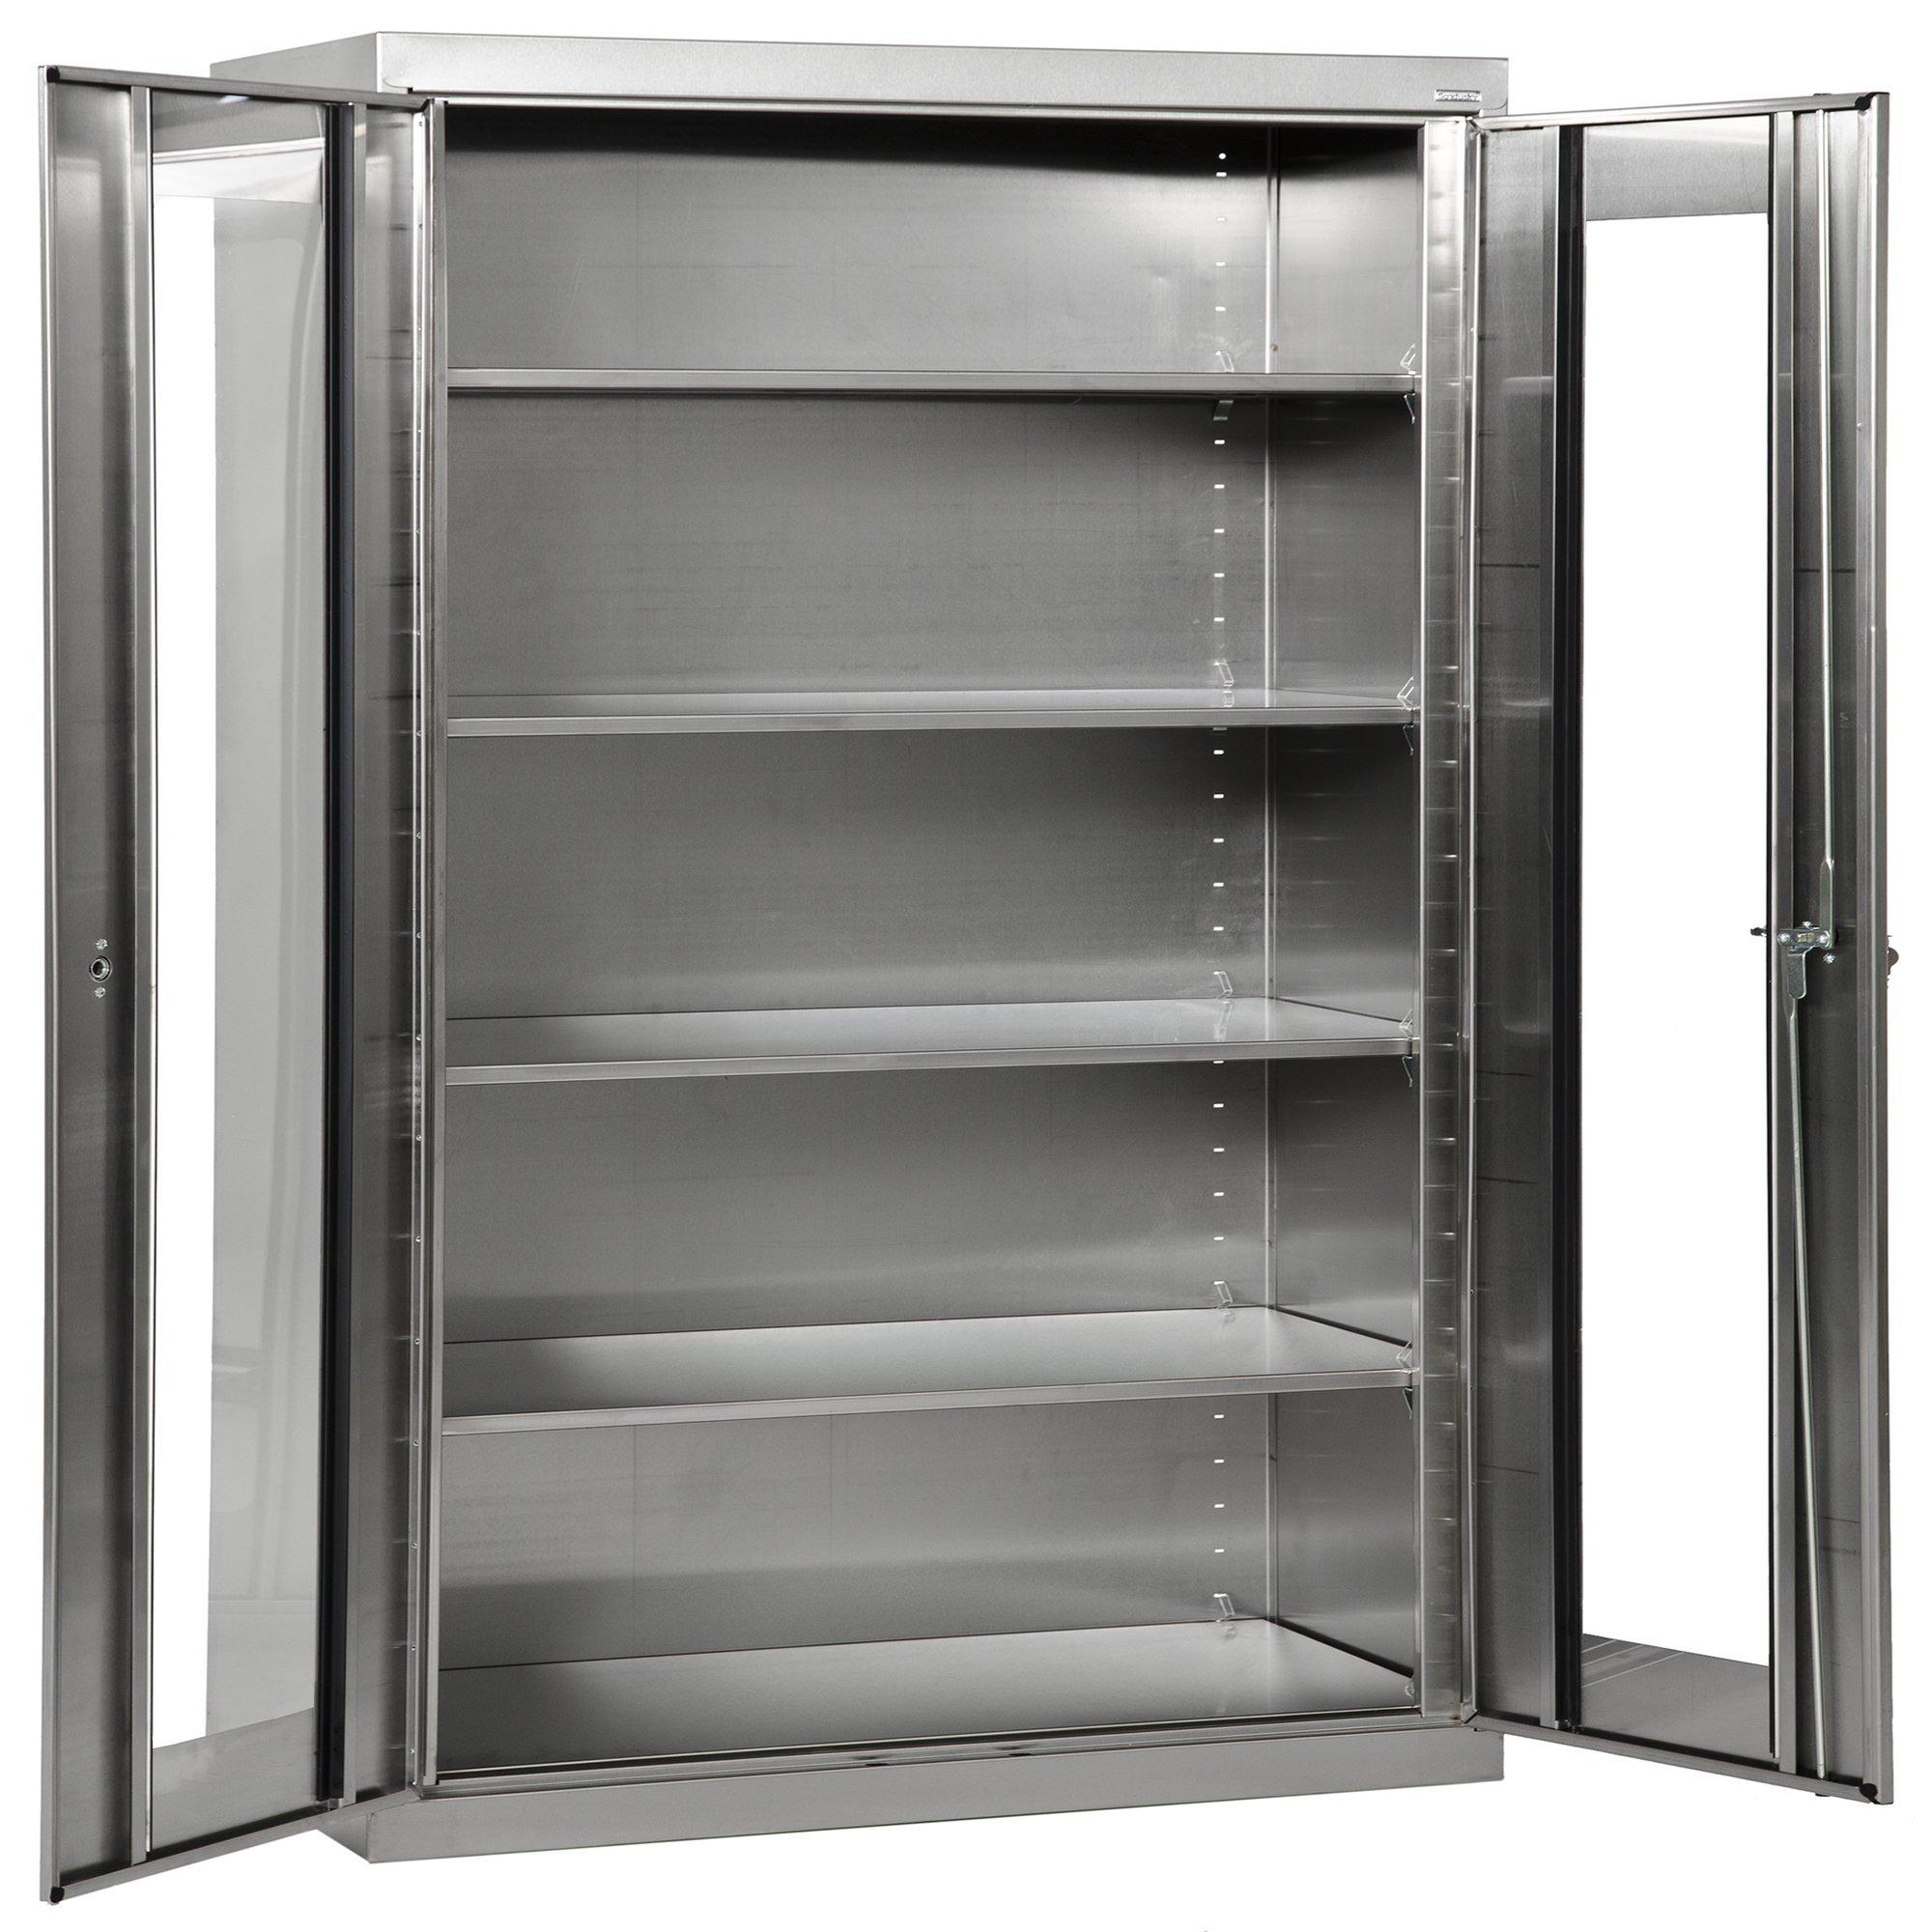 Sandusky SA4V482478-XX Stainless Steel Clear View Storage Cabinet, 4 Adjustable Shelves, 400 lb. Per Shelf Capacity, 78'' Height x 48'' Width x 24'' Depth